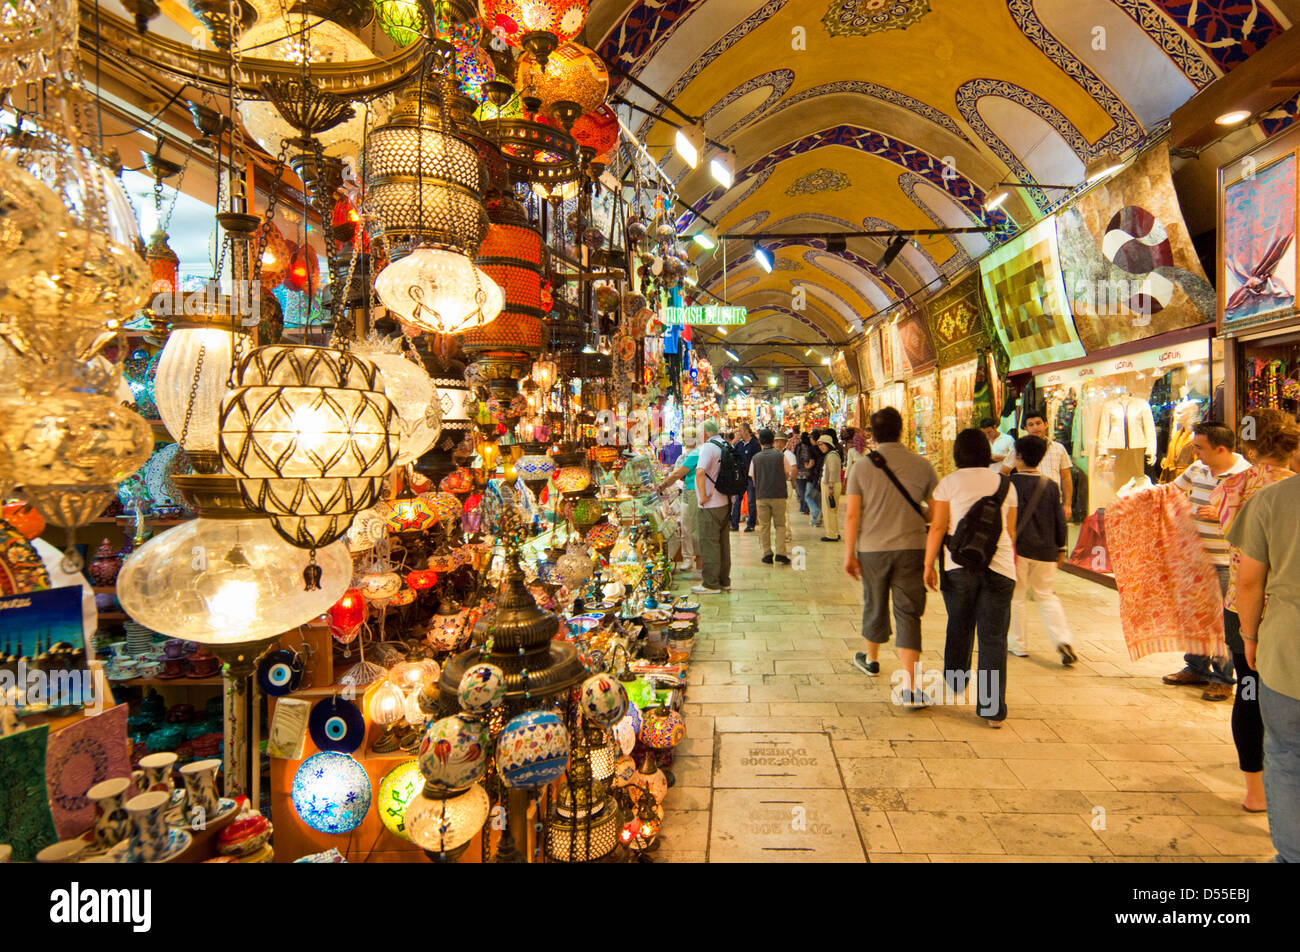 Tourists in Grand Bazaar, Kapali Carsi, Sultanahmet, Istanbul, Turkey - Stock Image